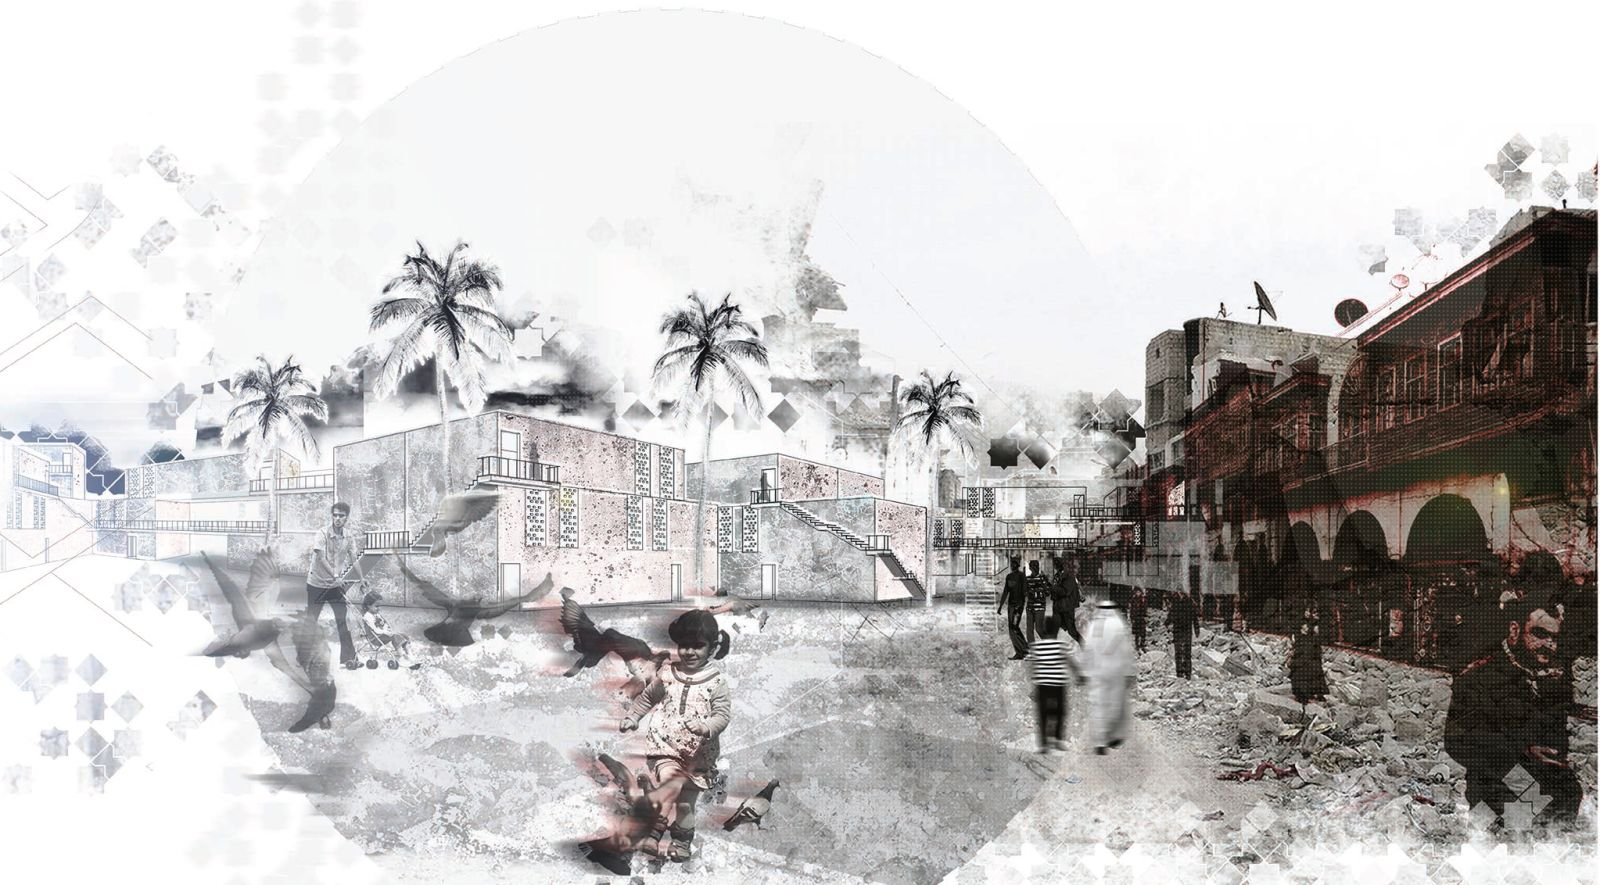 Reconstructing Syria- Post-war architectural development - Sheet1